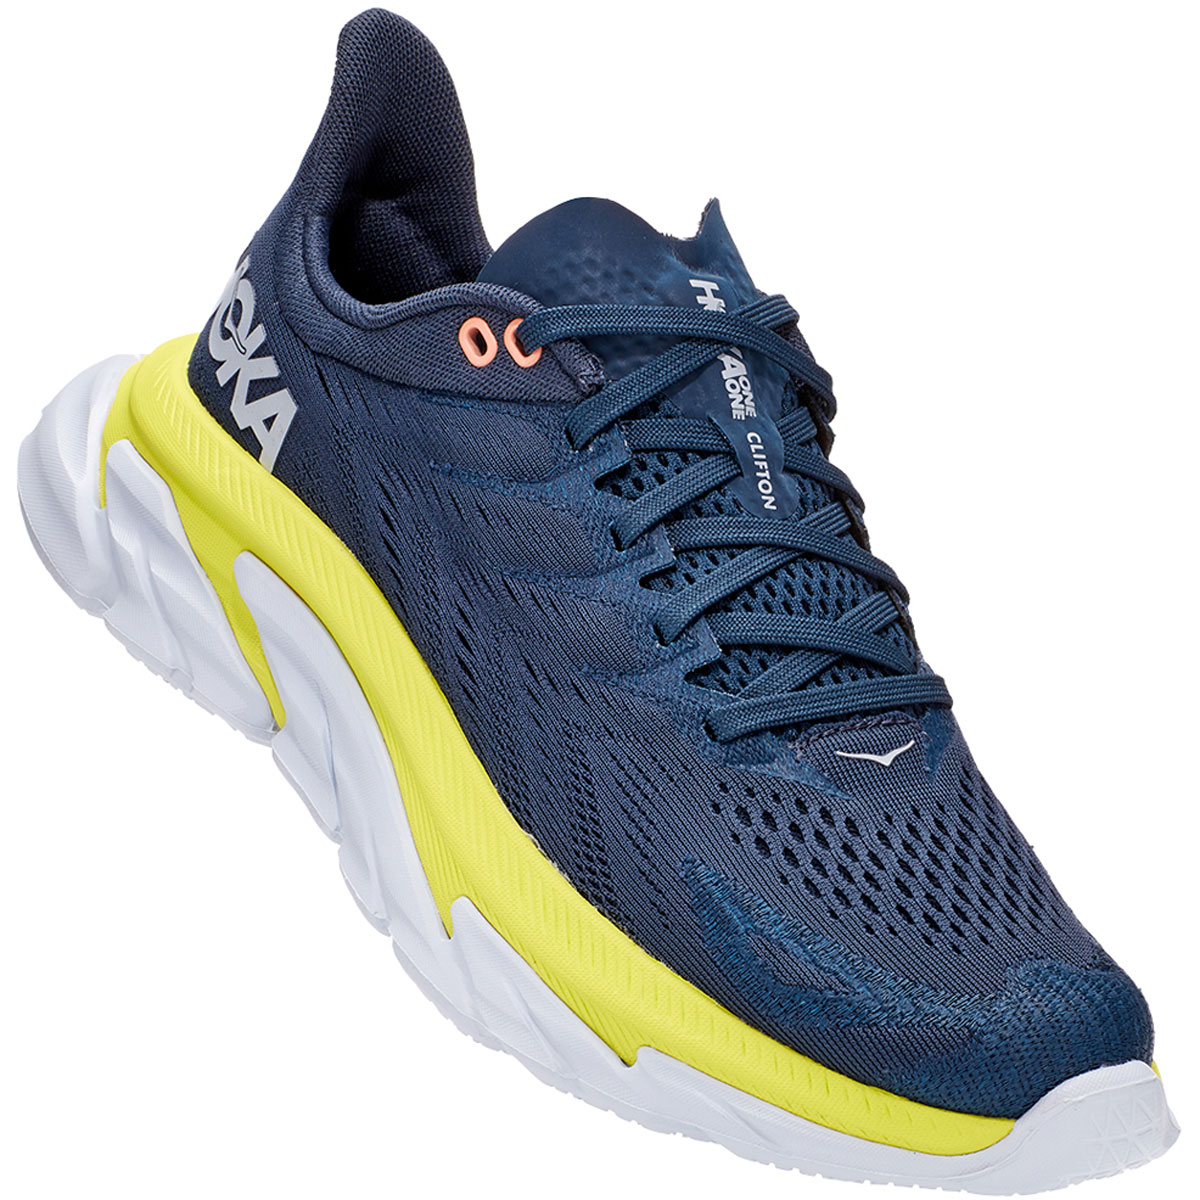 Women's Hoka One One Clifton Edge Running Shoe - Color: Moonlit Ocean/Evening Primrose - Size: 5 - Width: Regular, Moonlit Ocean/Evening Primrose, large, image 4